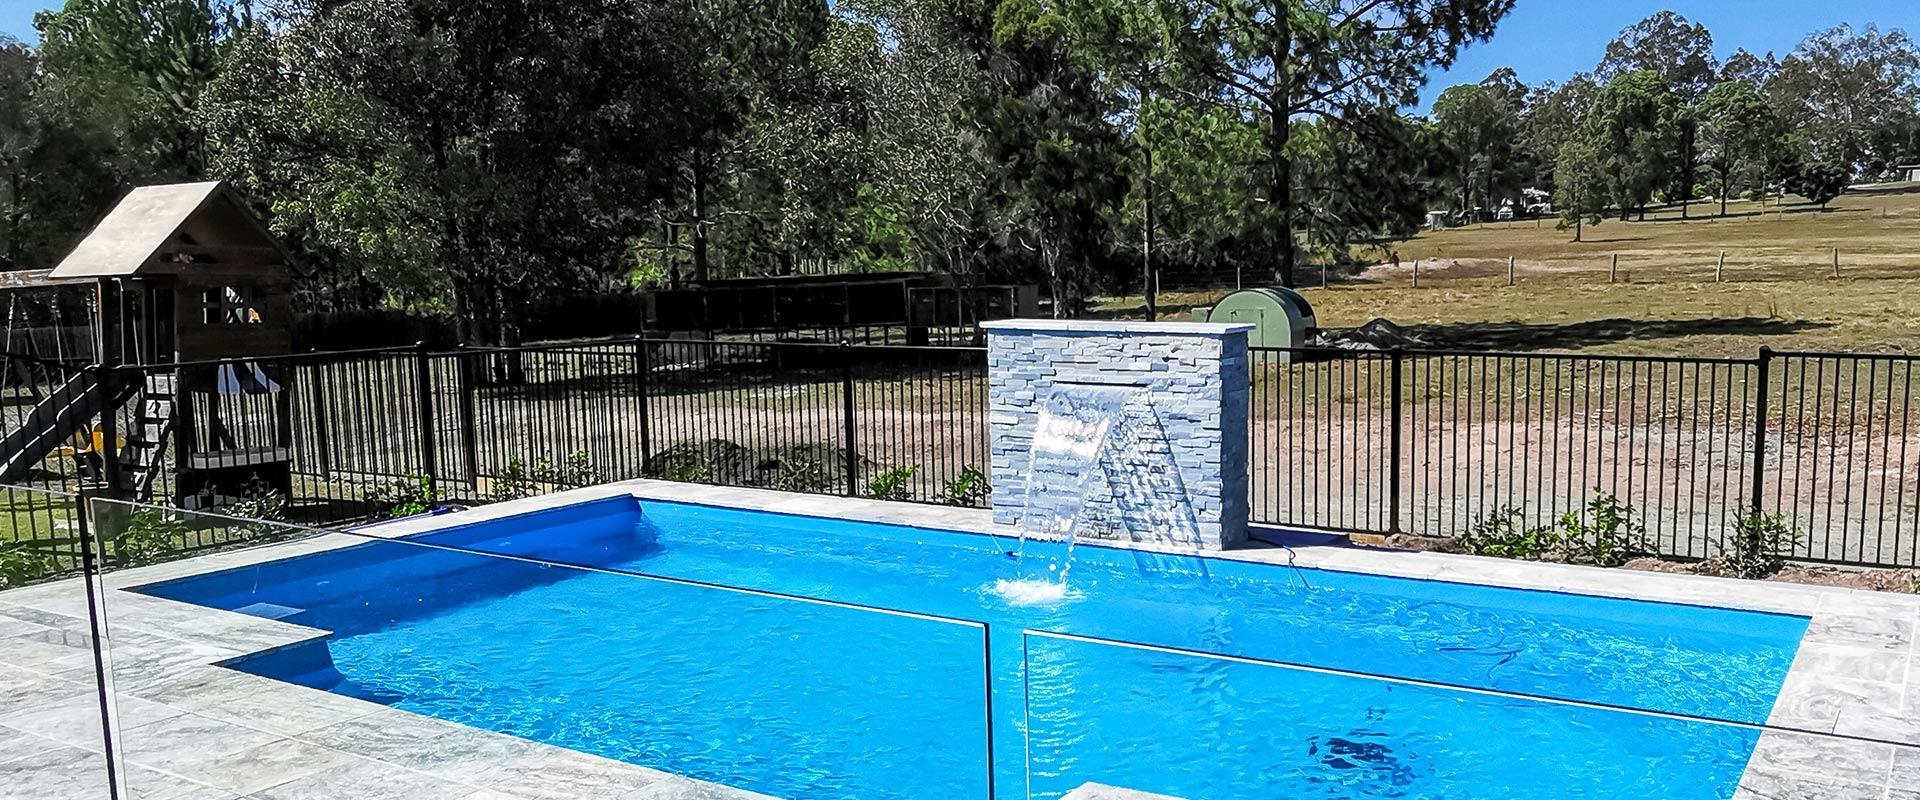 Sapphire Starlight pool companies brisbane